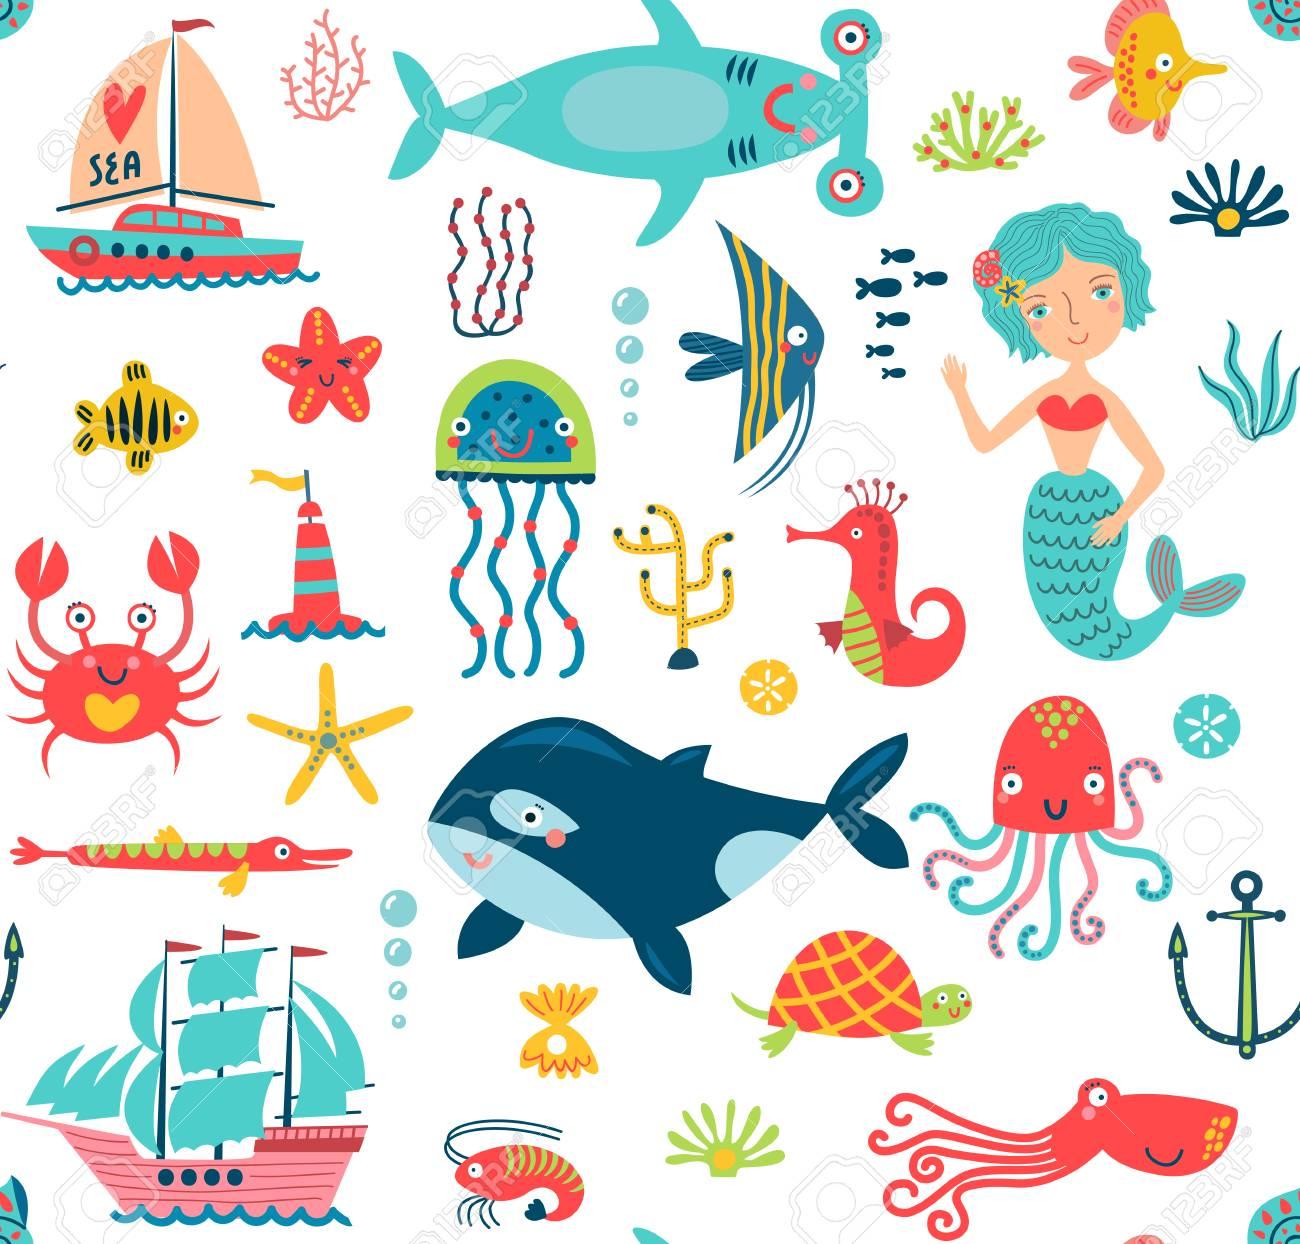 Marine life seamless pattern - 82717620